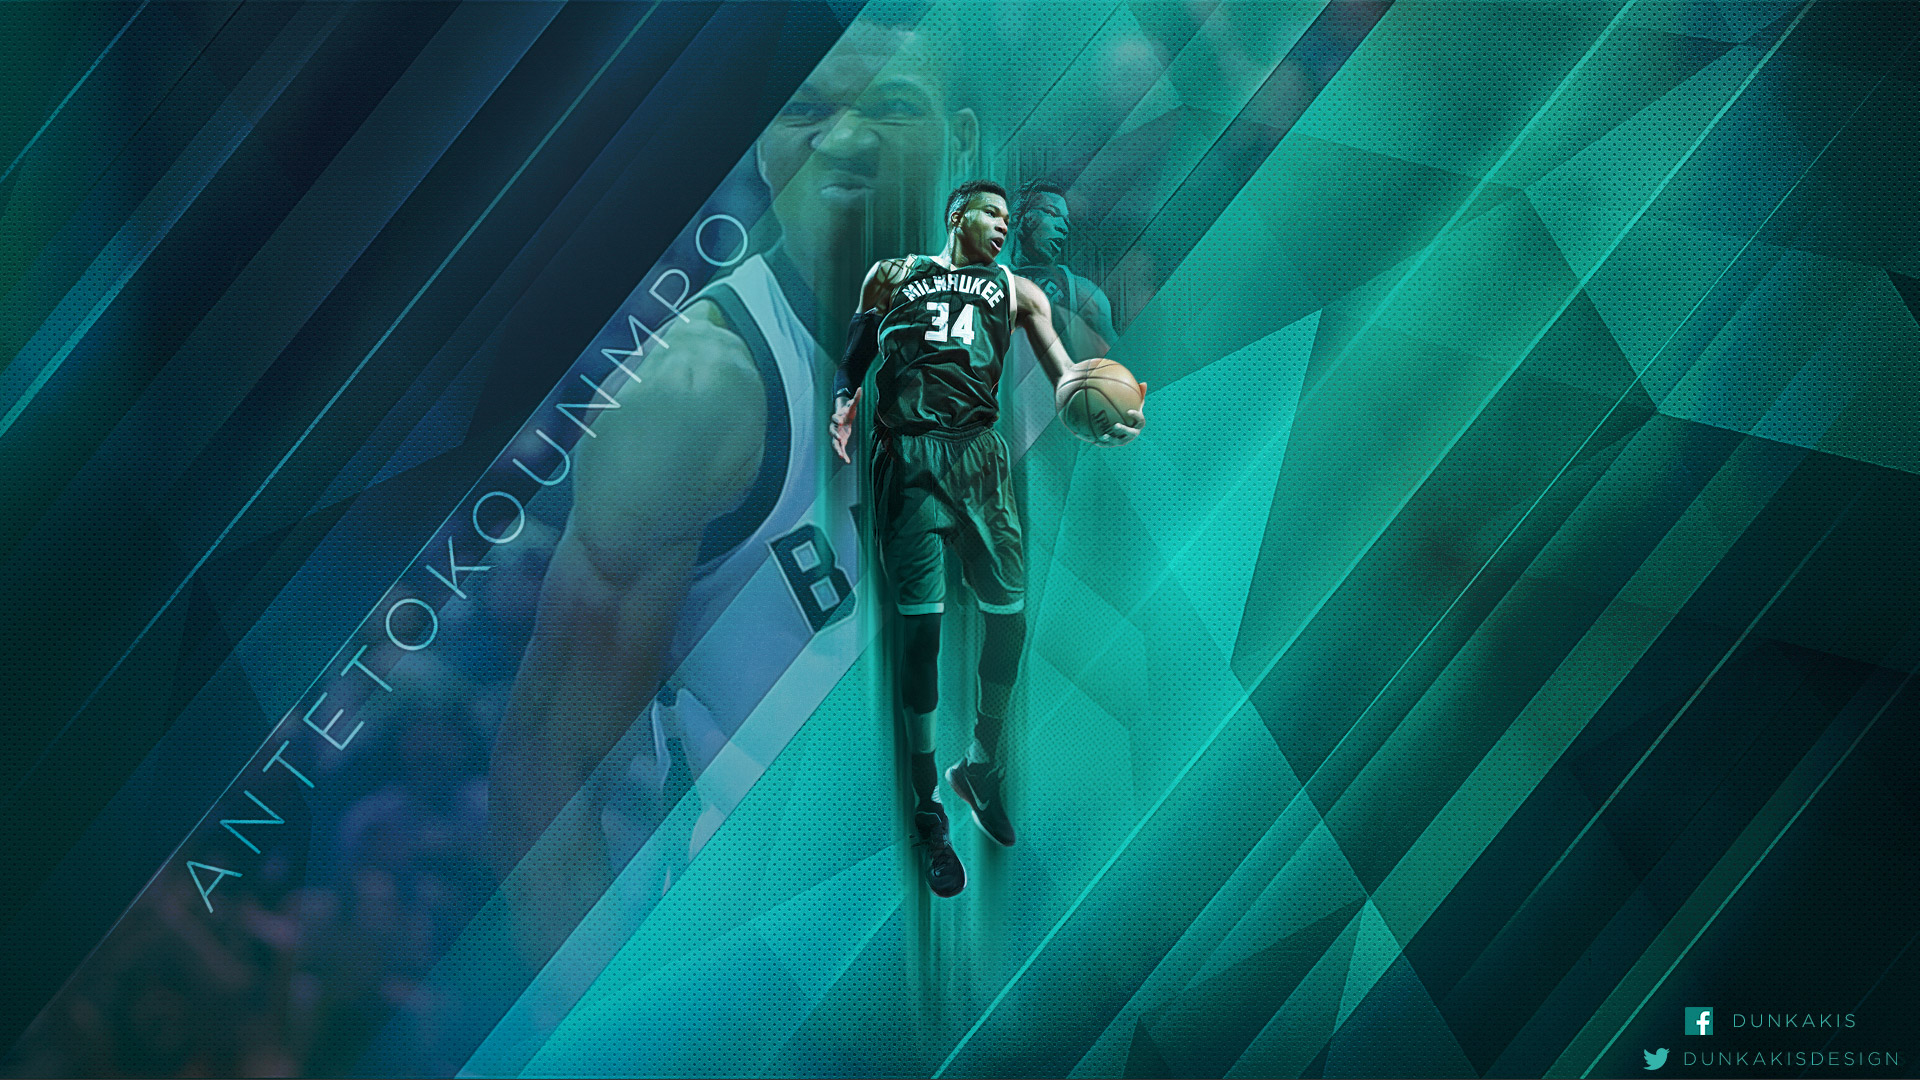 HD Basketball Wallpapers Wallpaper